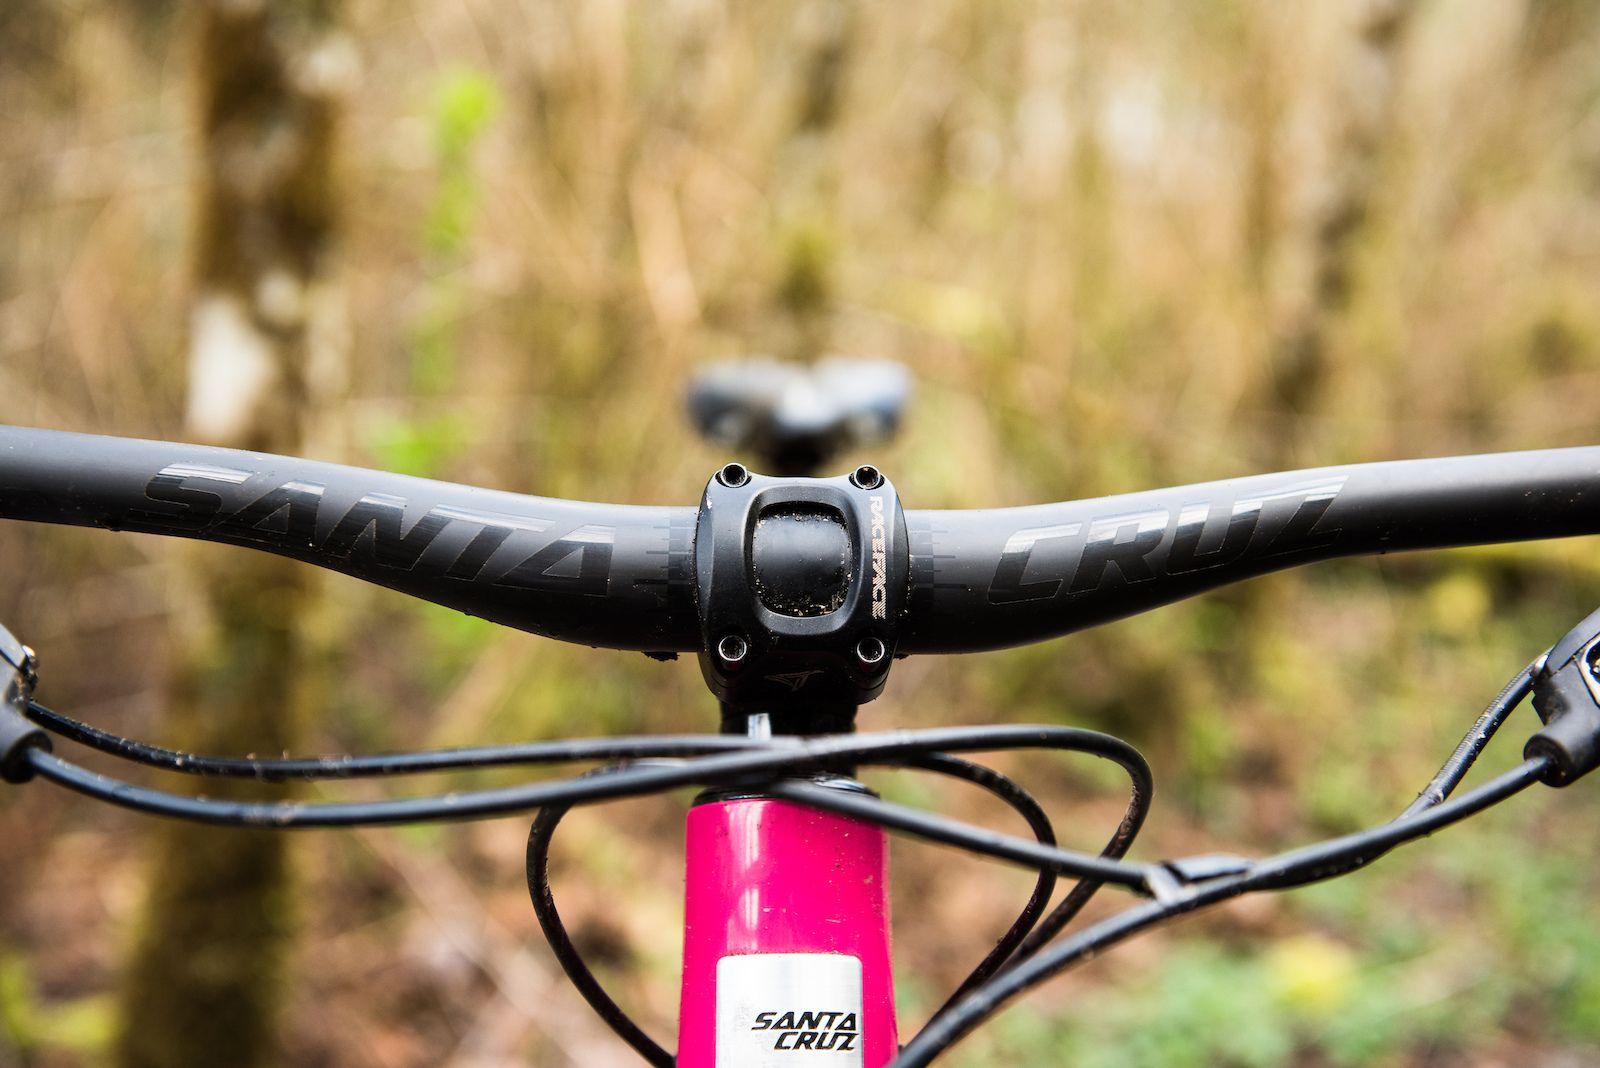 Renthal FatBar Carbon Handlebar 40mm Rise 800mm Width 35mm Clamp